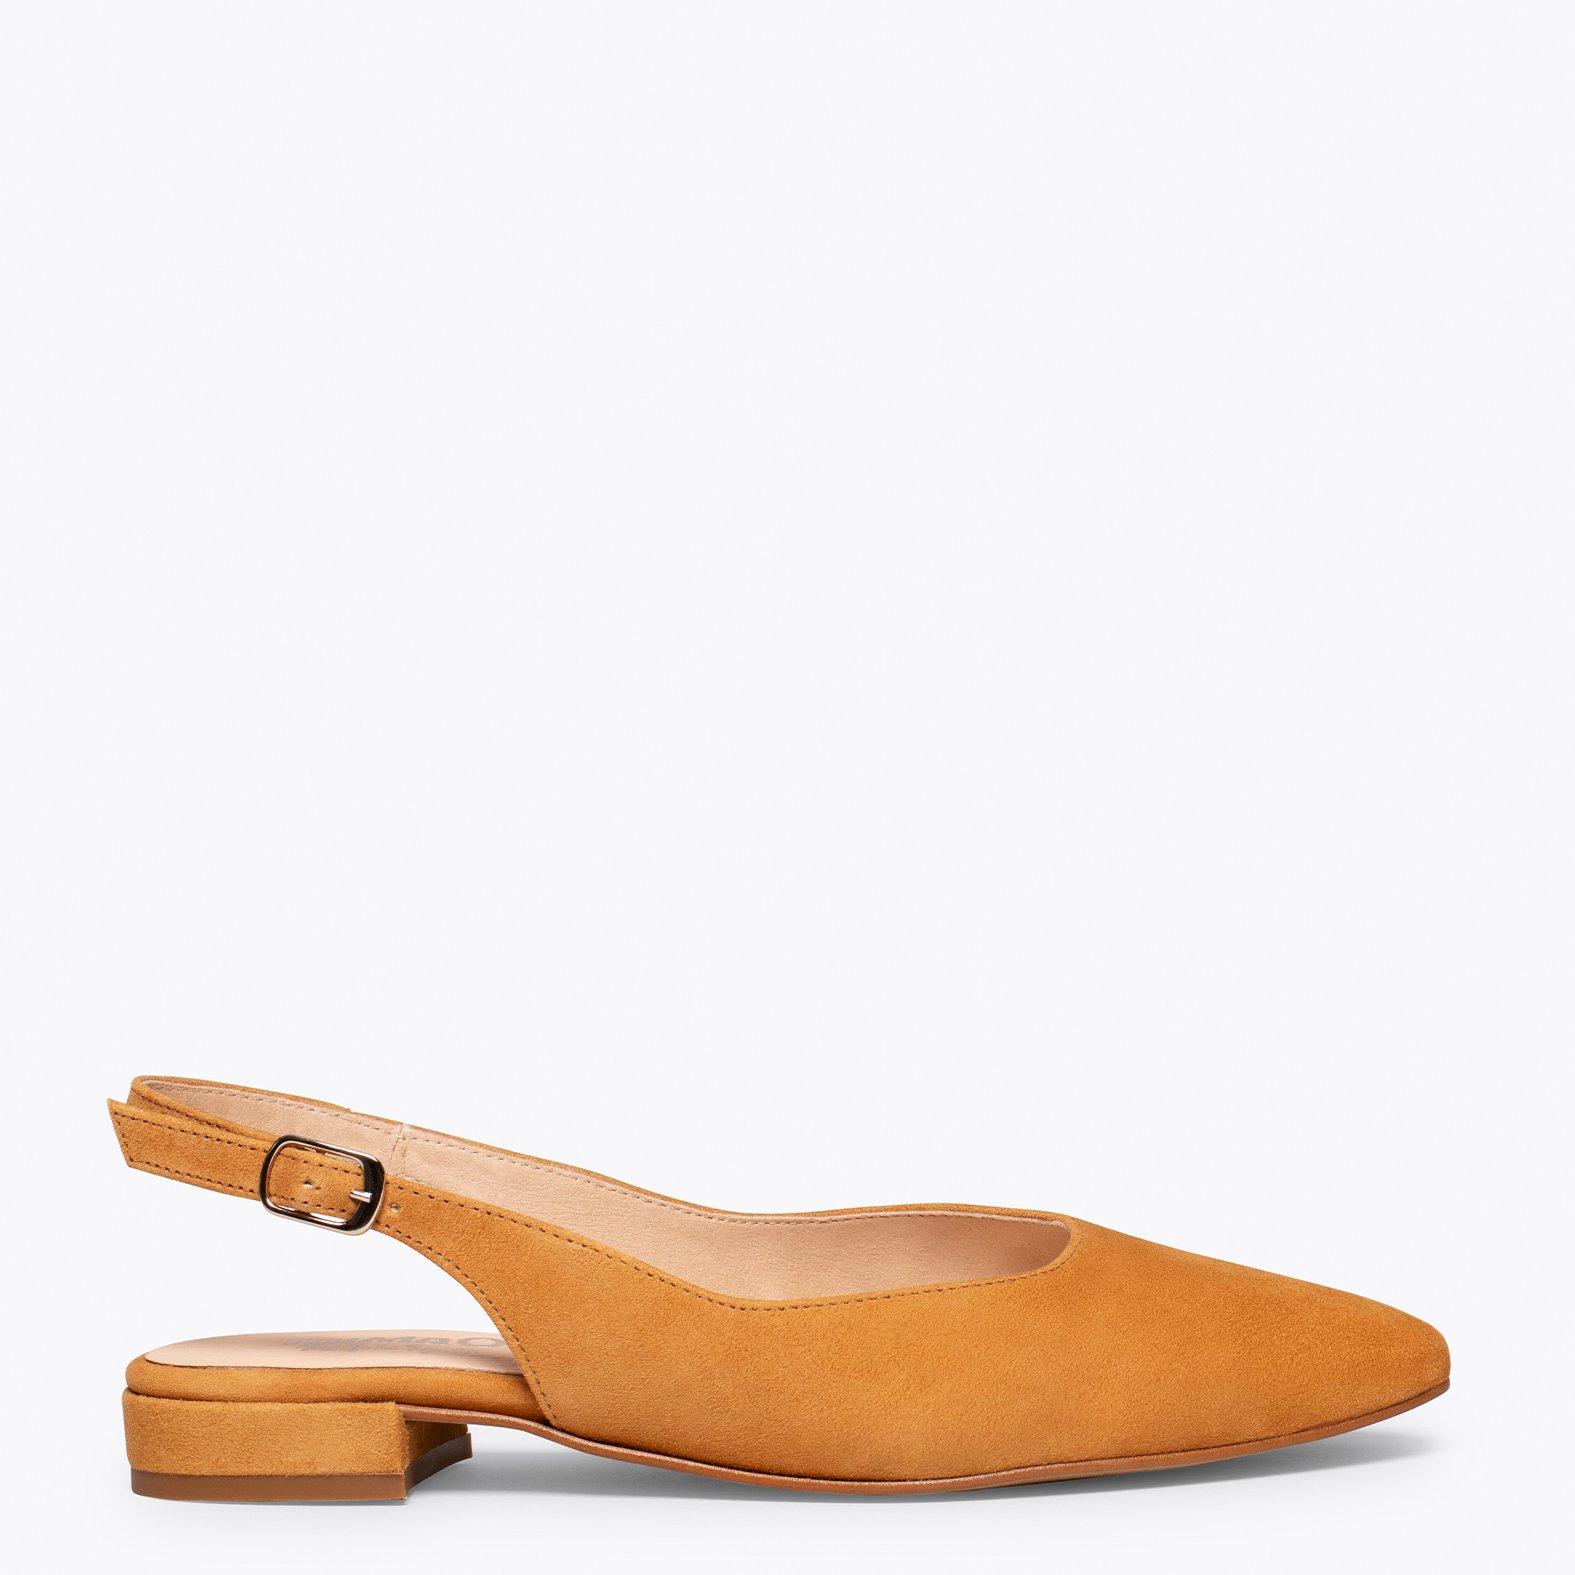 BRUNCH Zapato plano destalonado CAMEL